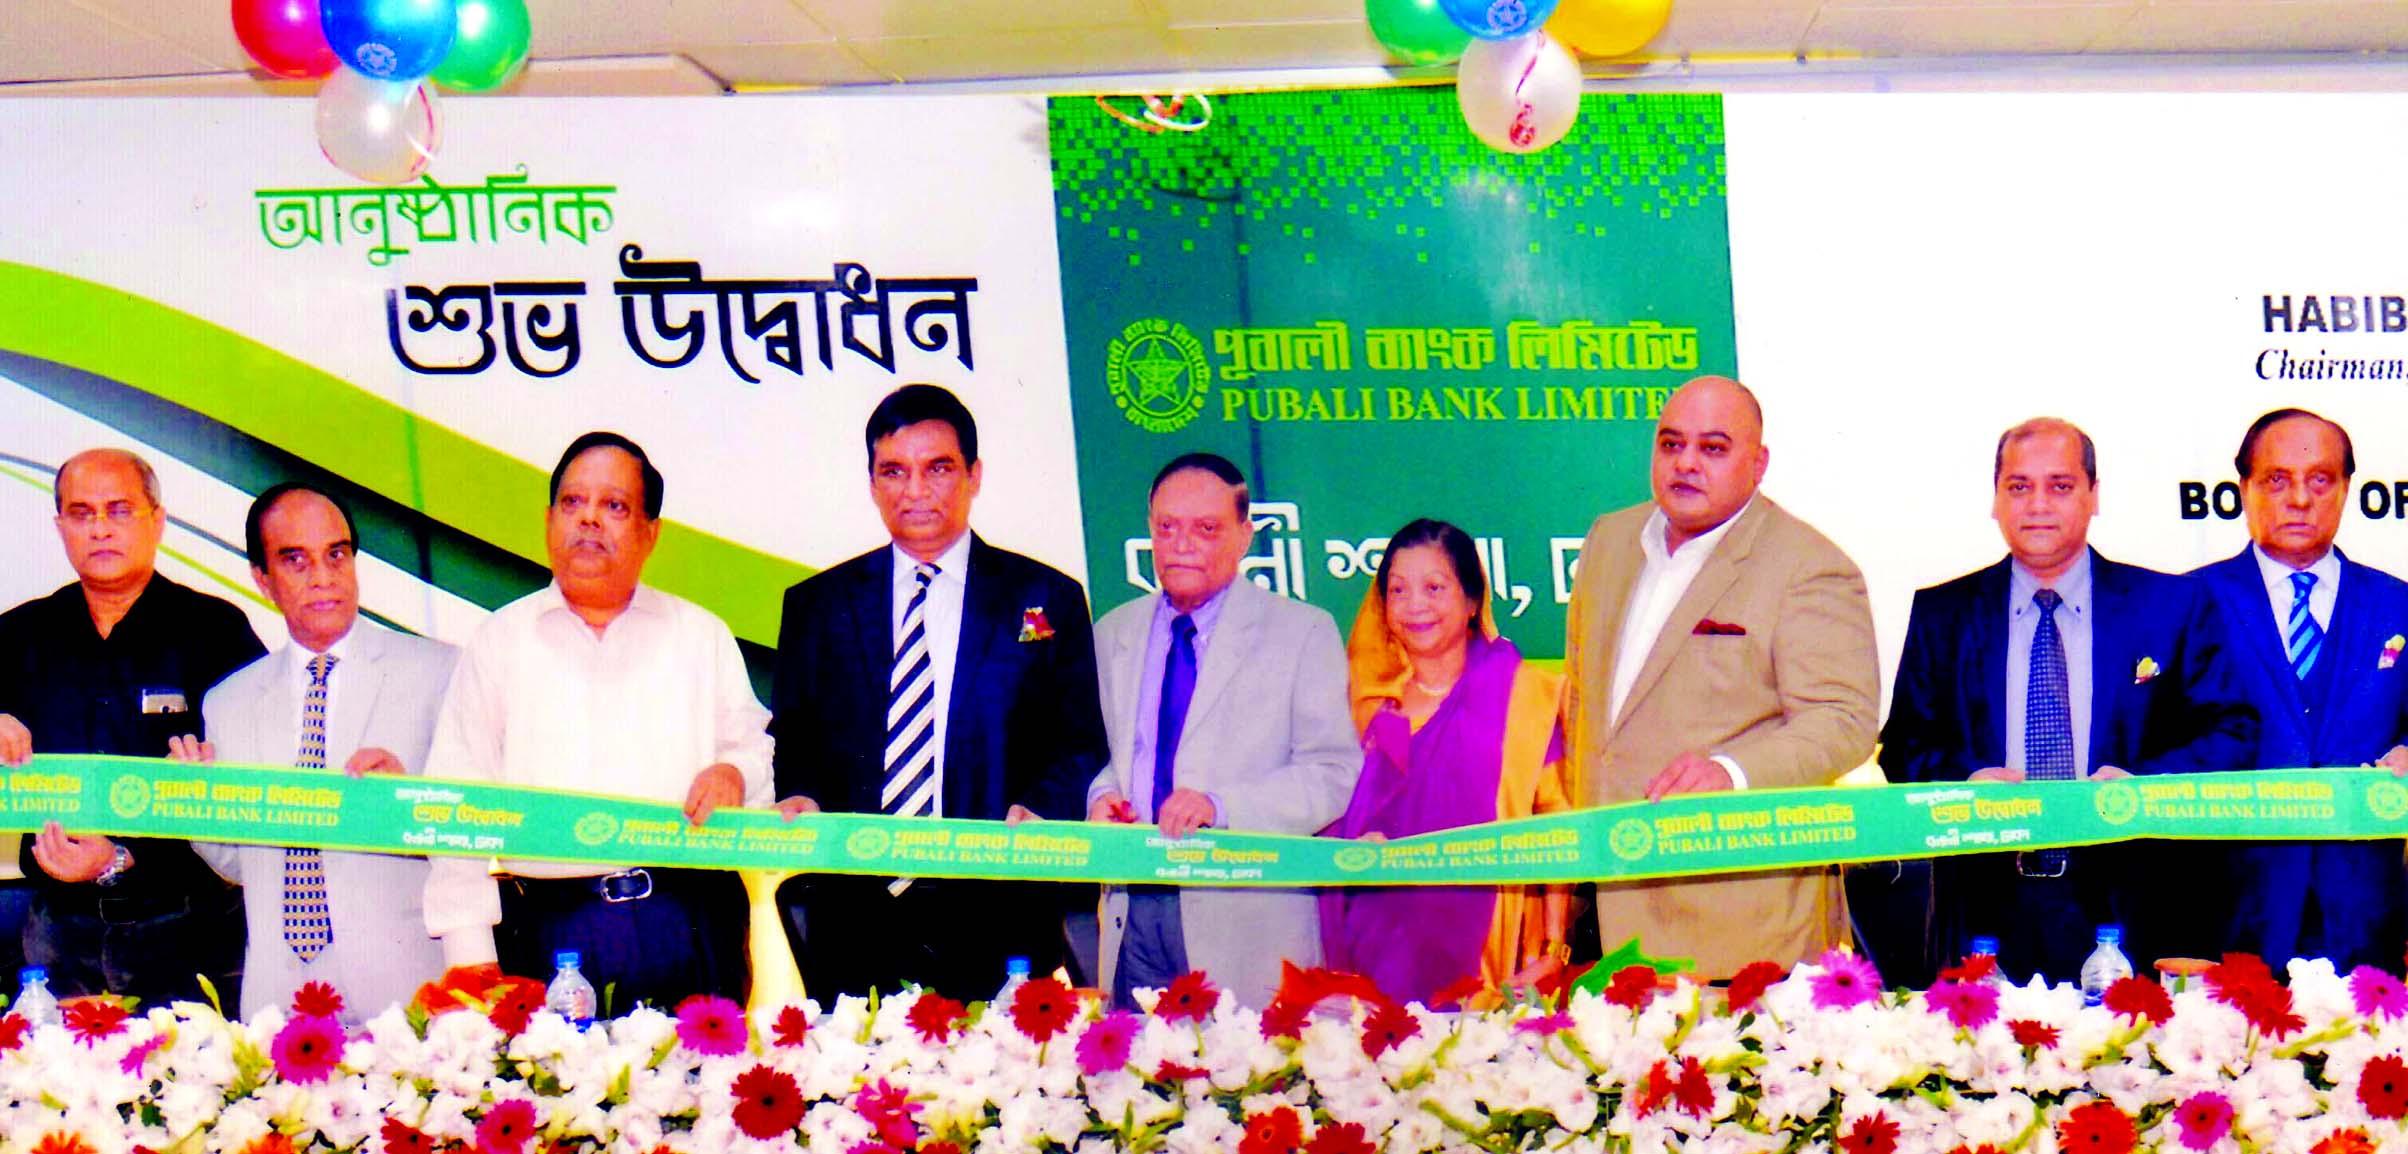 Habibur Rahman, Chairman, Board of Directors of Pubali Bank Limited ...